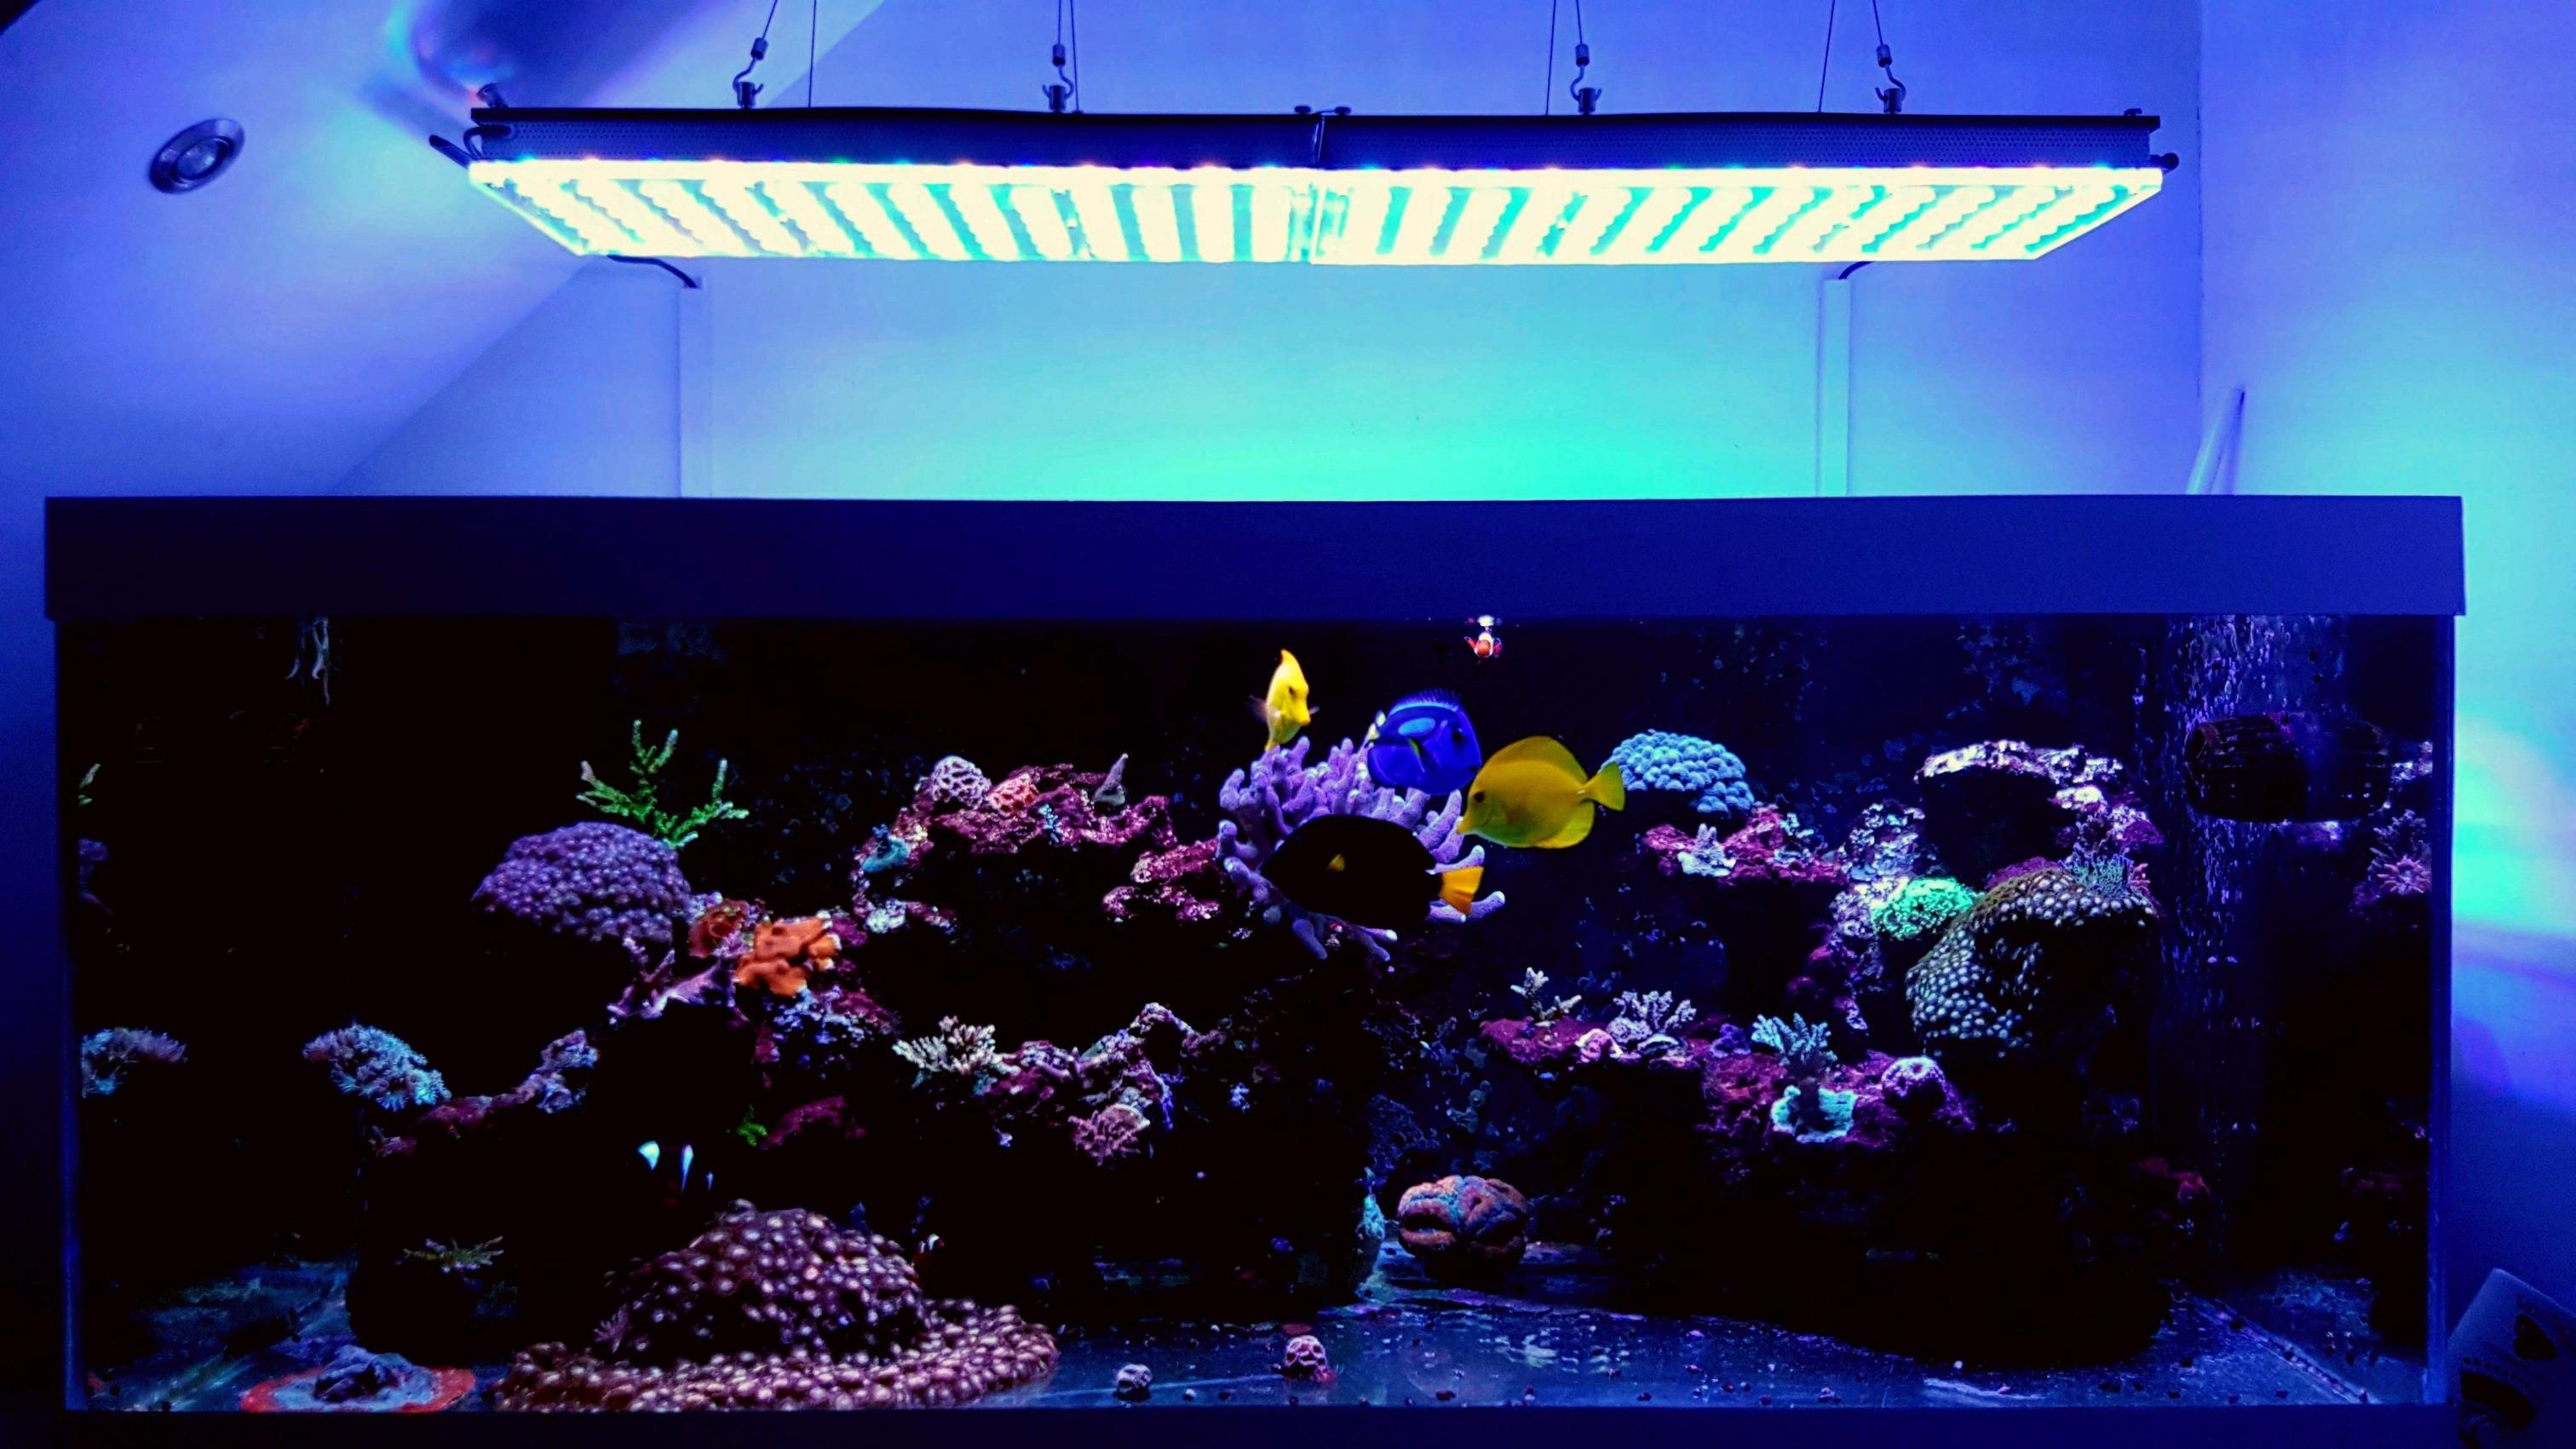 led with in liters aquarium uk orphek atlantik lighting makeover lights light